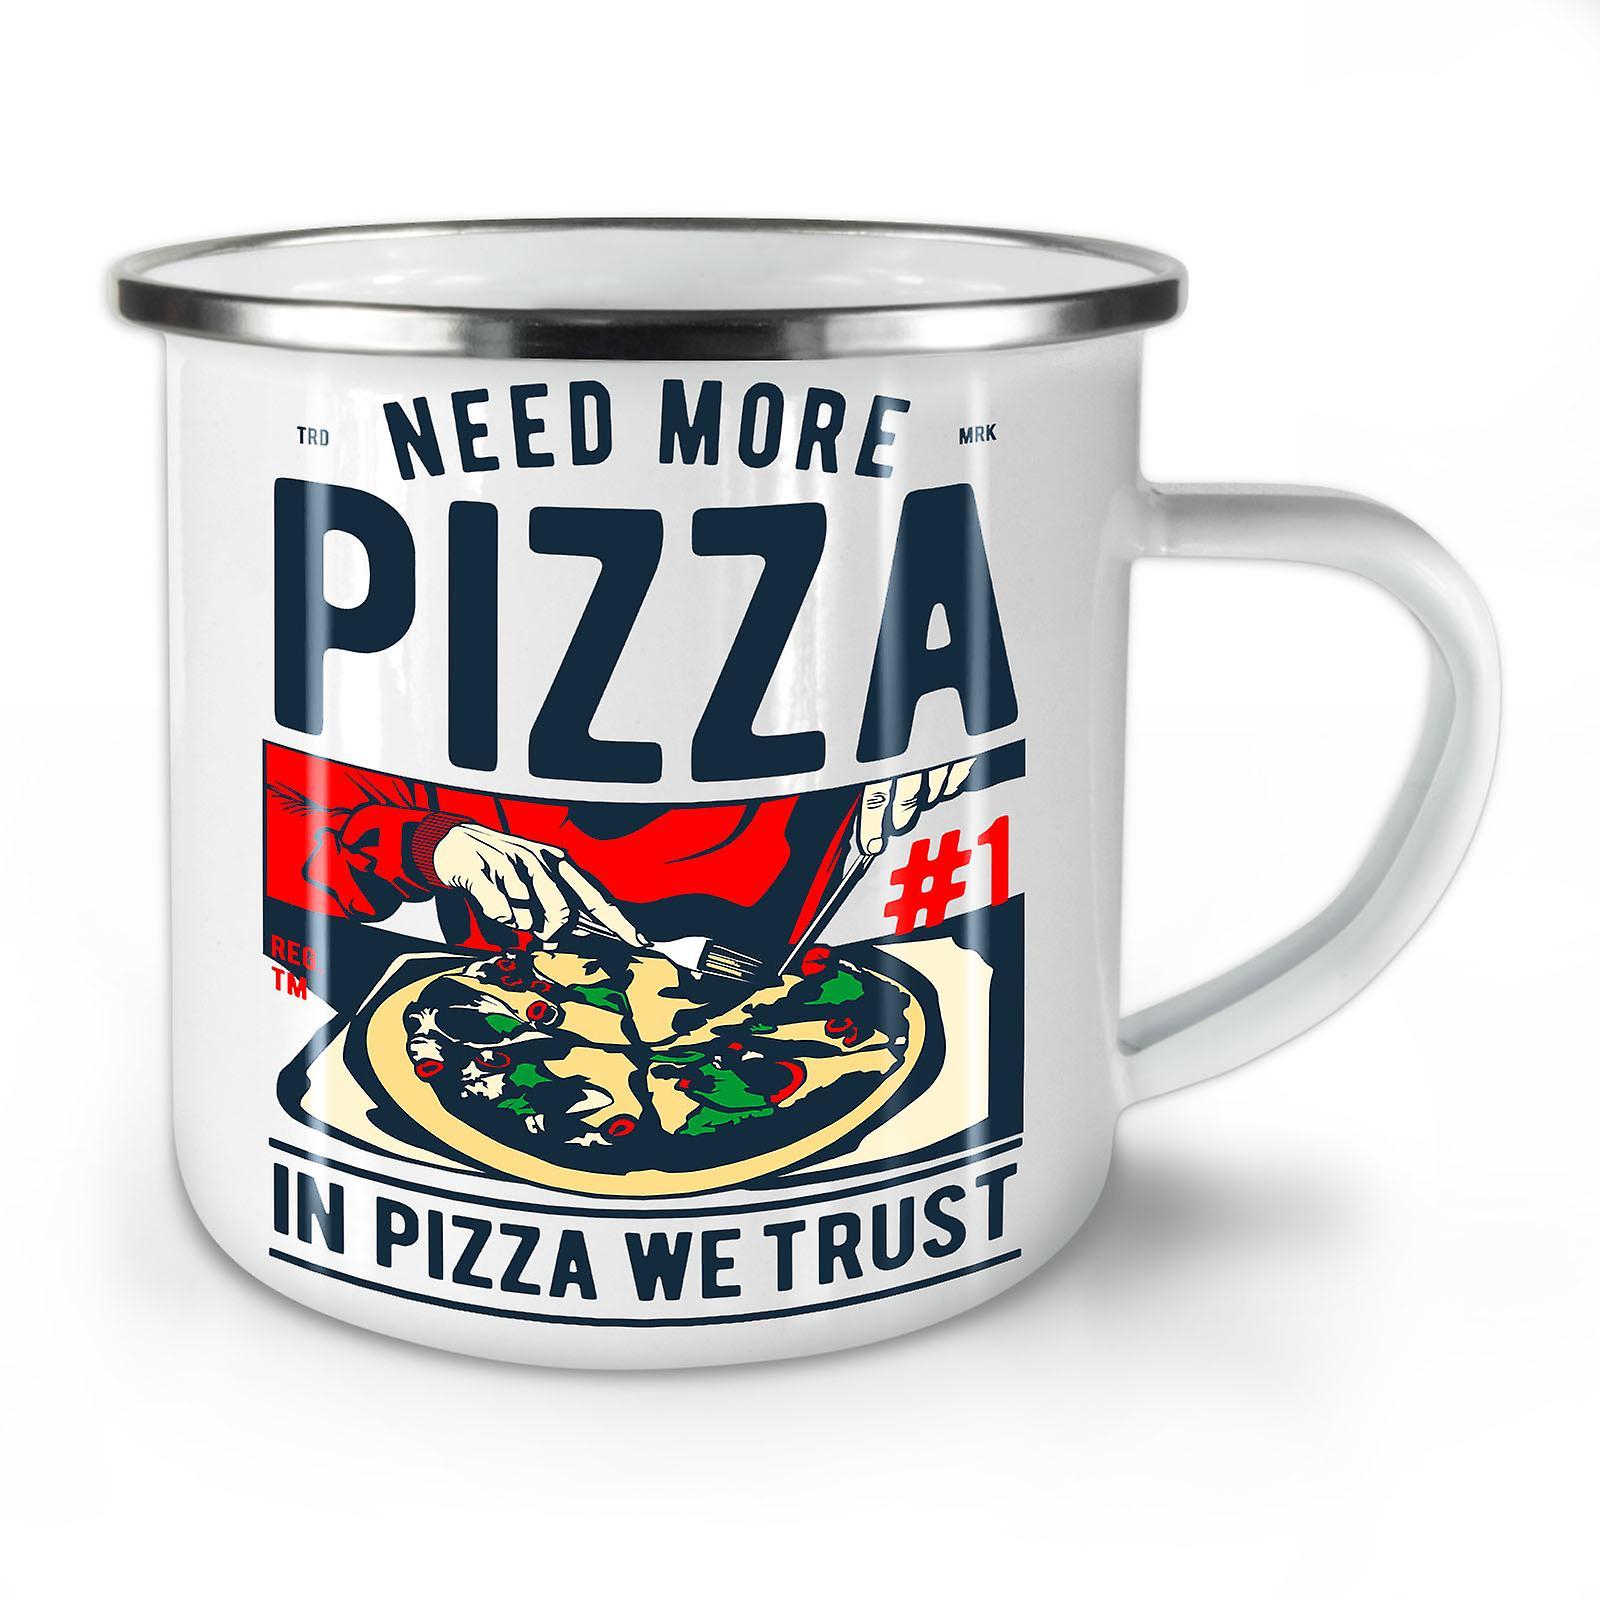 Nouveau Pizza Émail OzWellcoda Café We Whitetea Dans Trust Mug10 yvmnwN80O